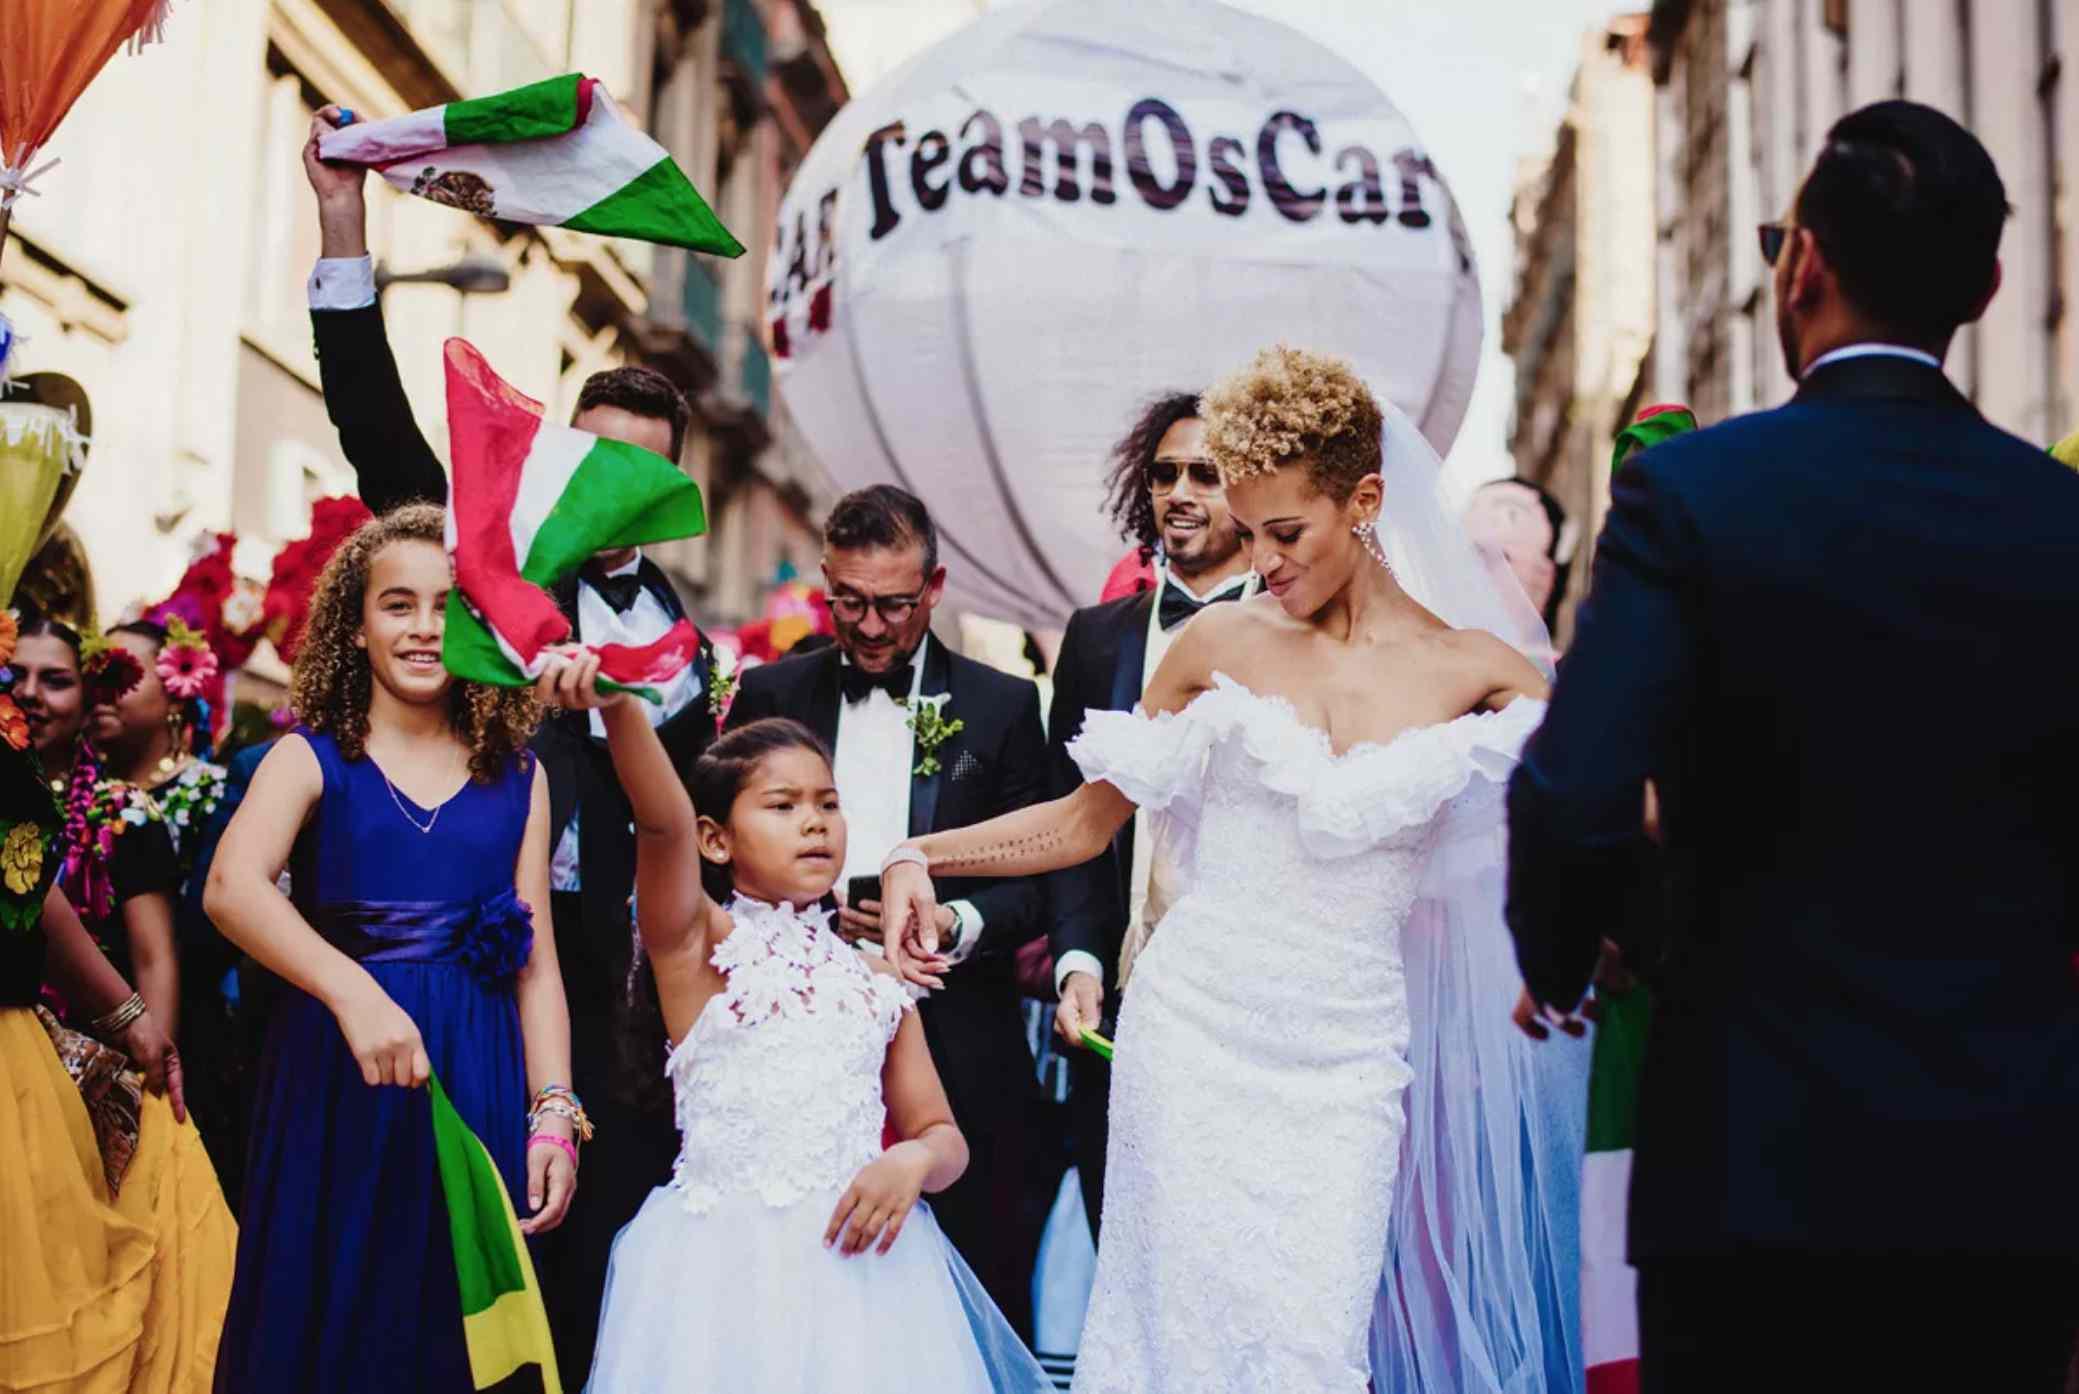 Carly Cushnie dancing in wedding parade